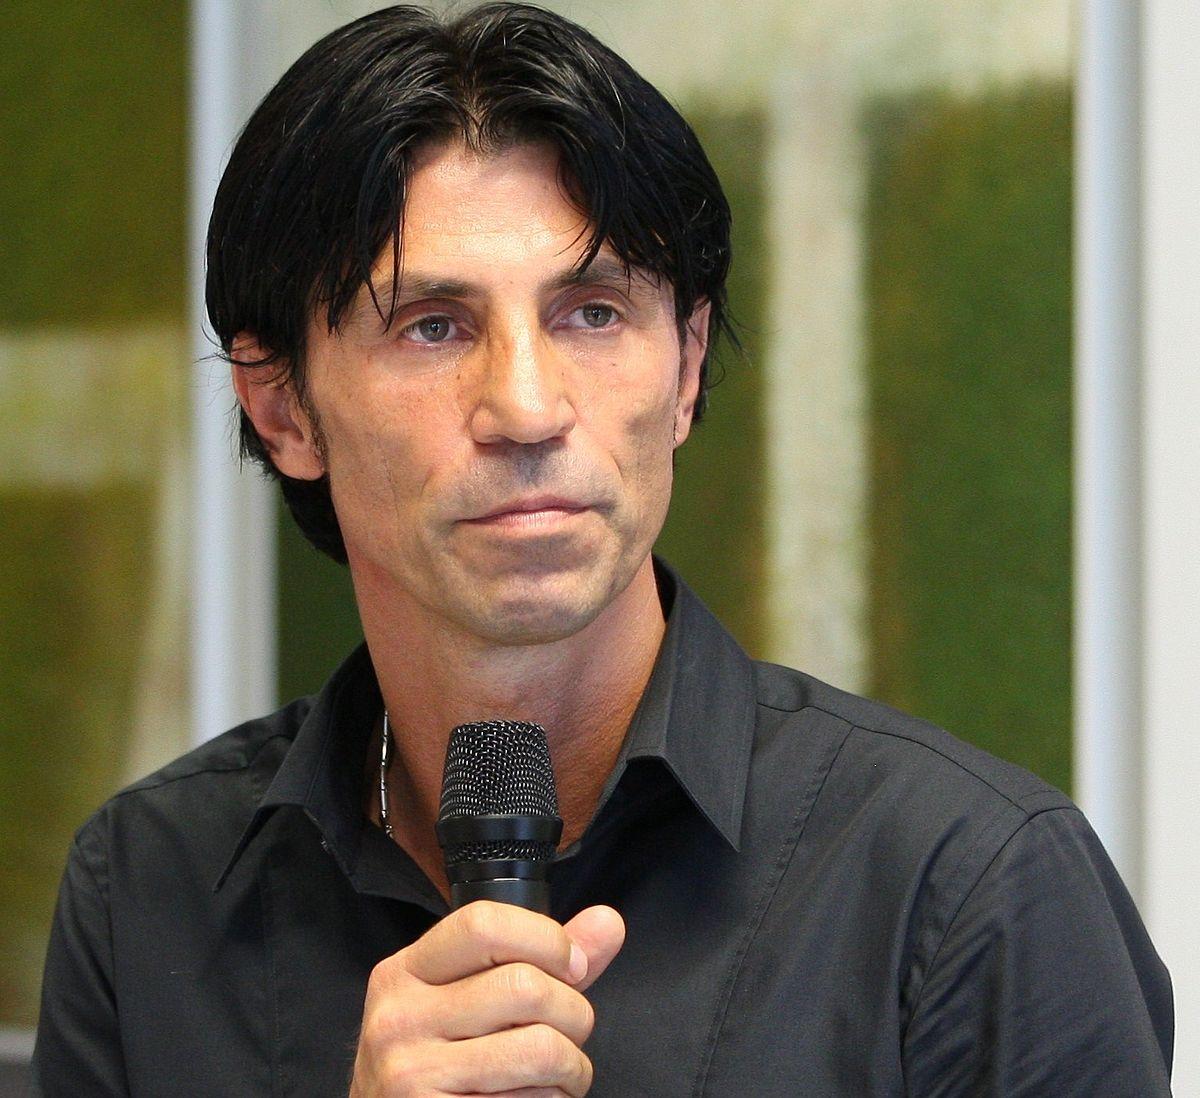 Bruno HГјbner